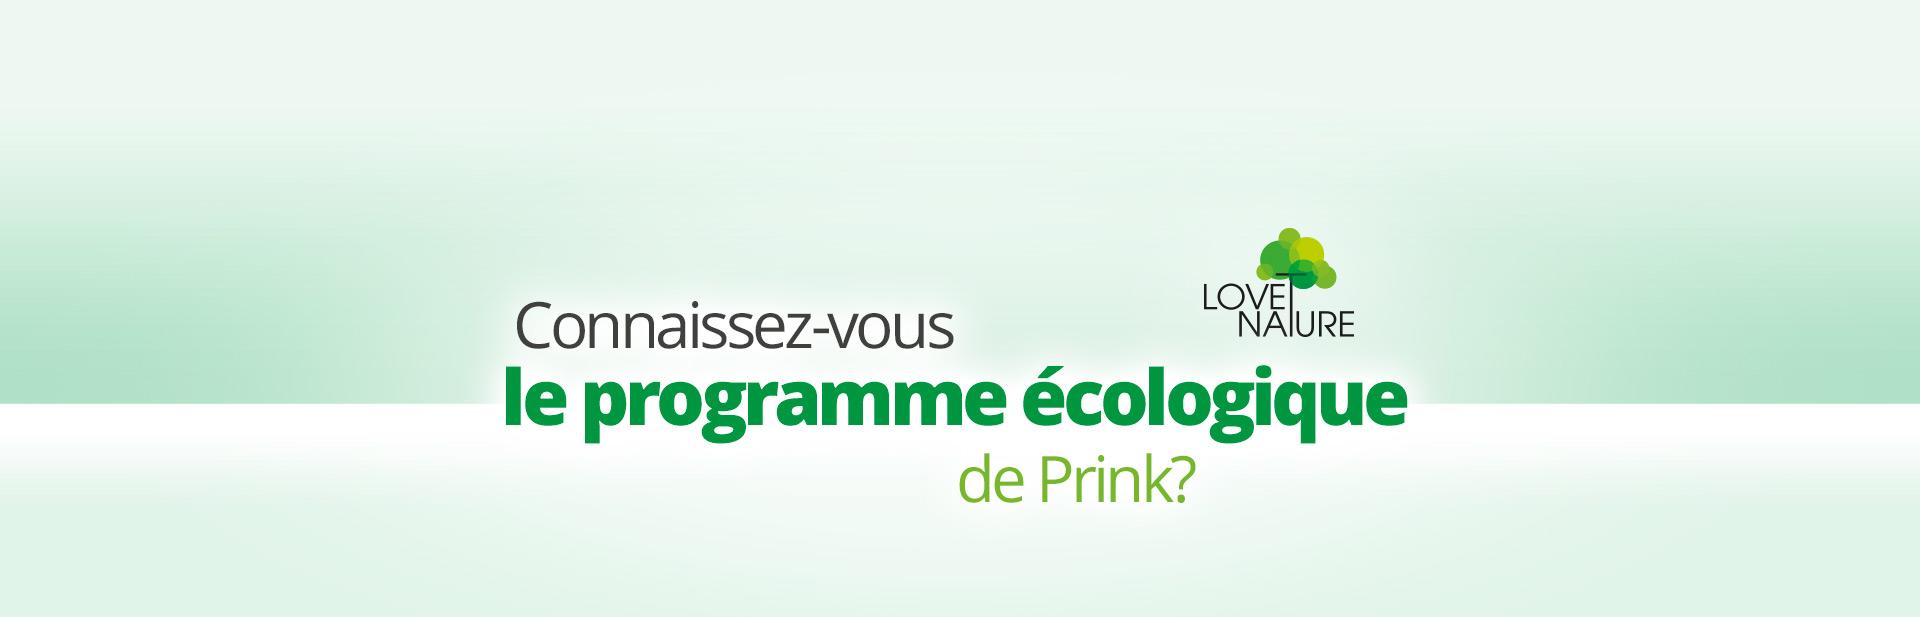 programma-ecologico-Prink-LOVE-NATURE-SLIDE